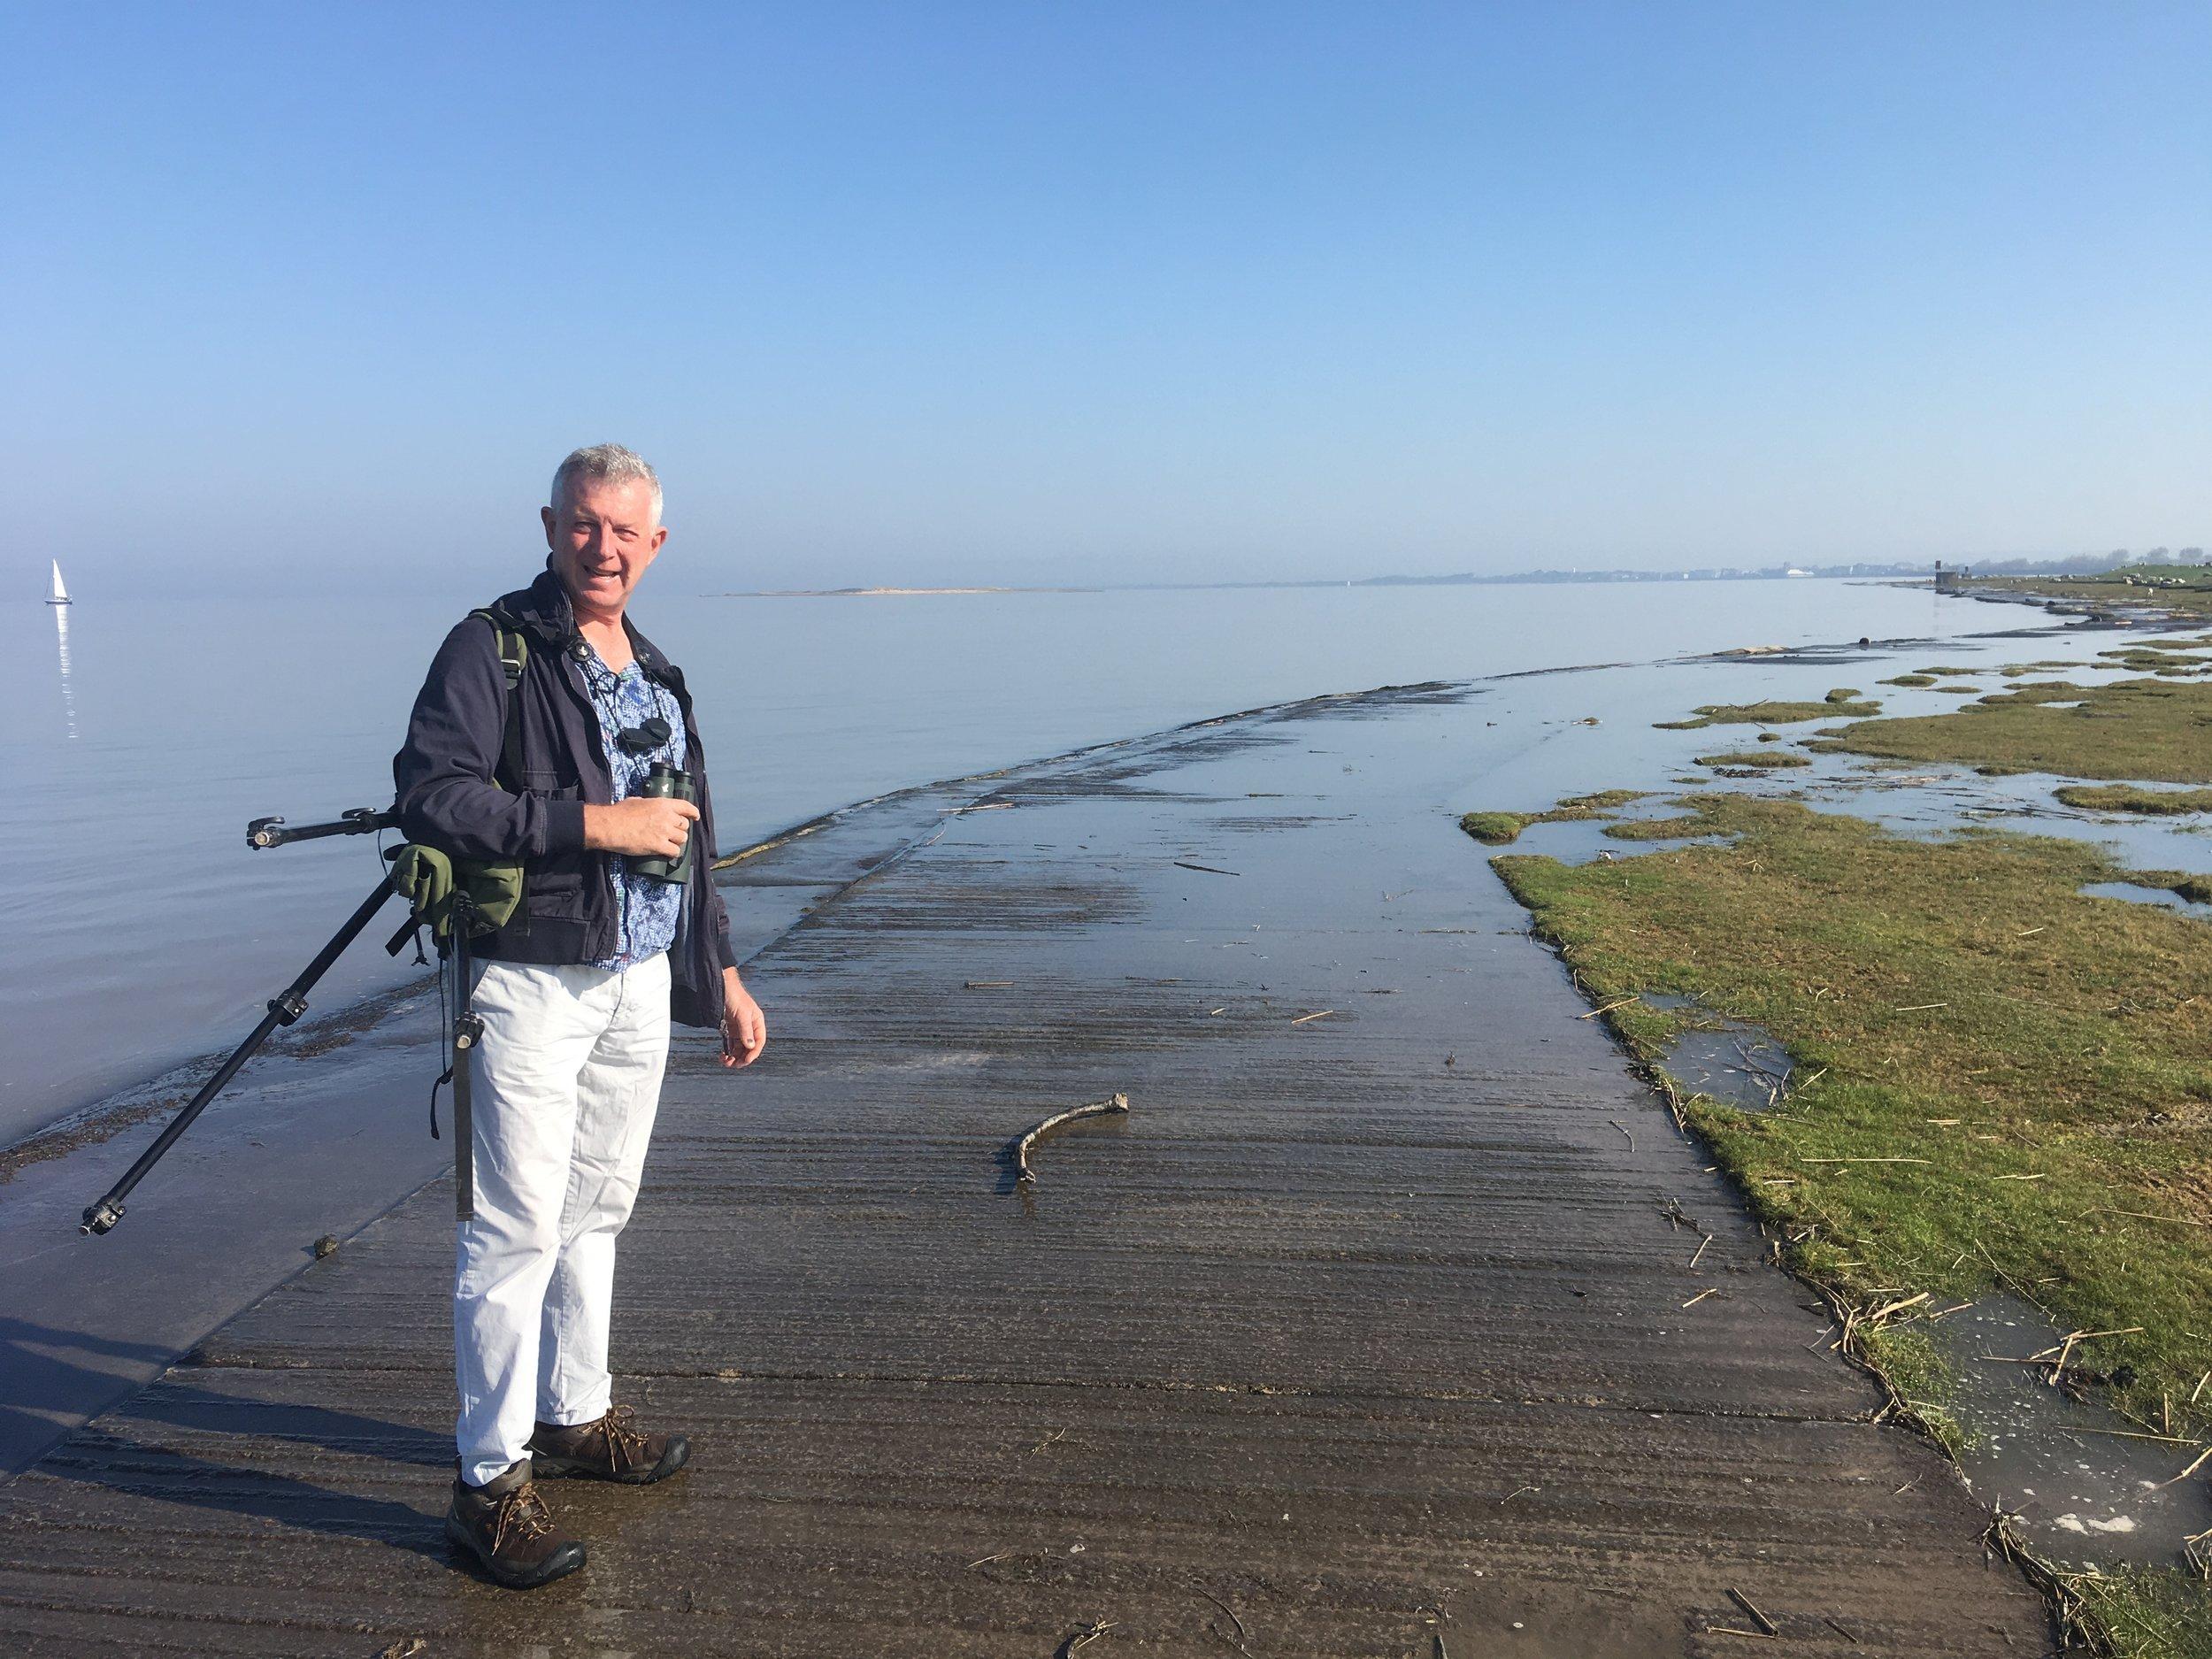 Stephen enjoying the high tide